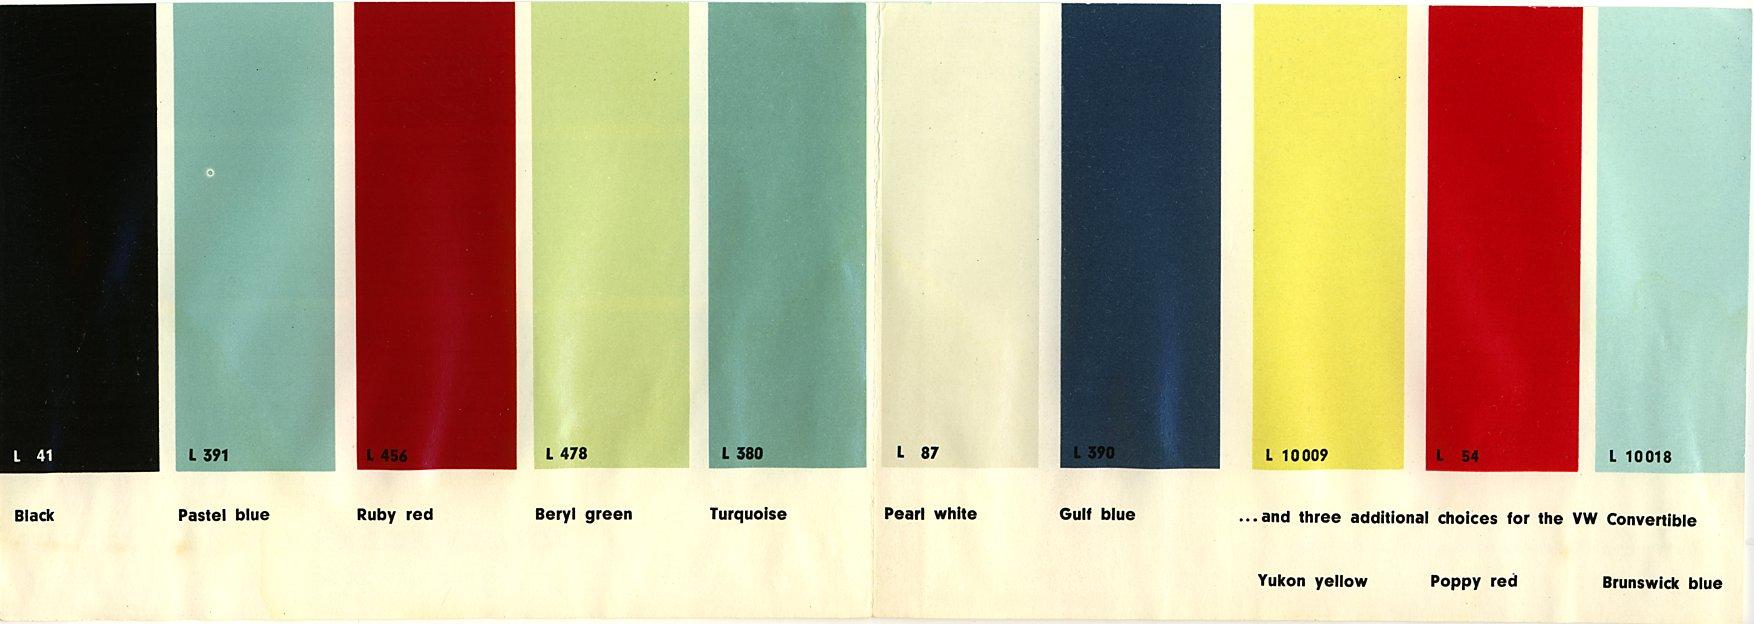 how to turn off windows colour scheme